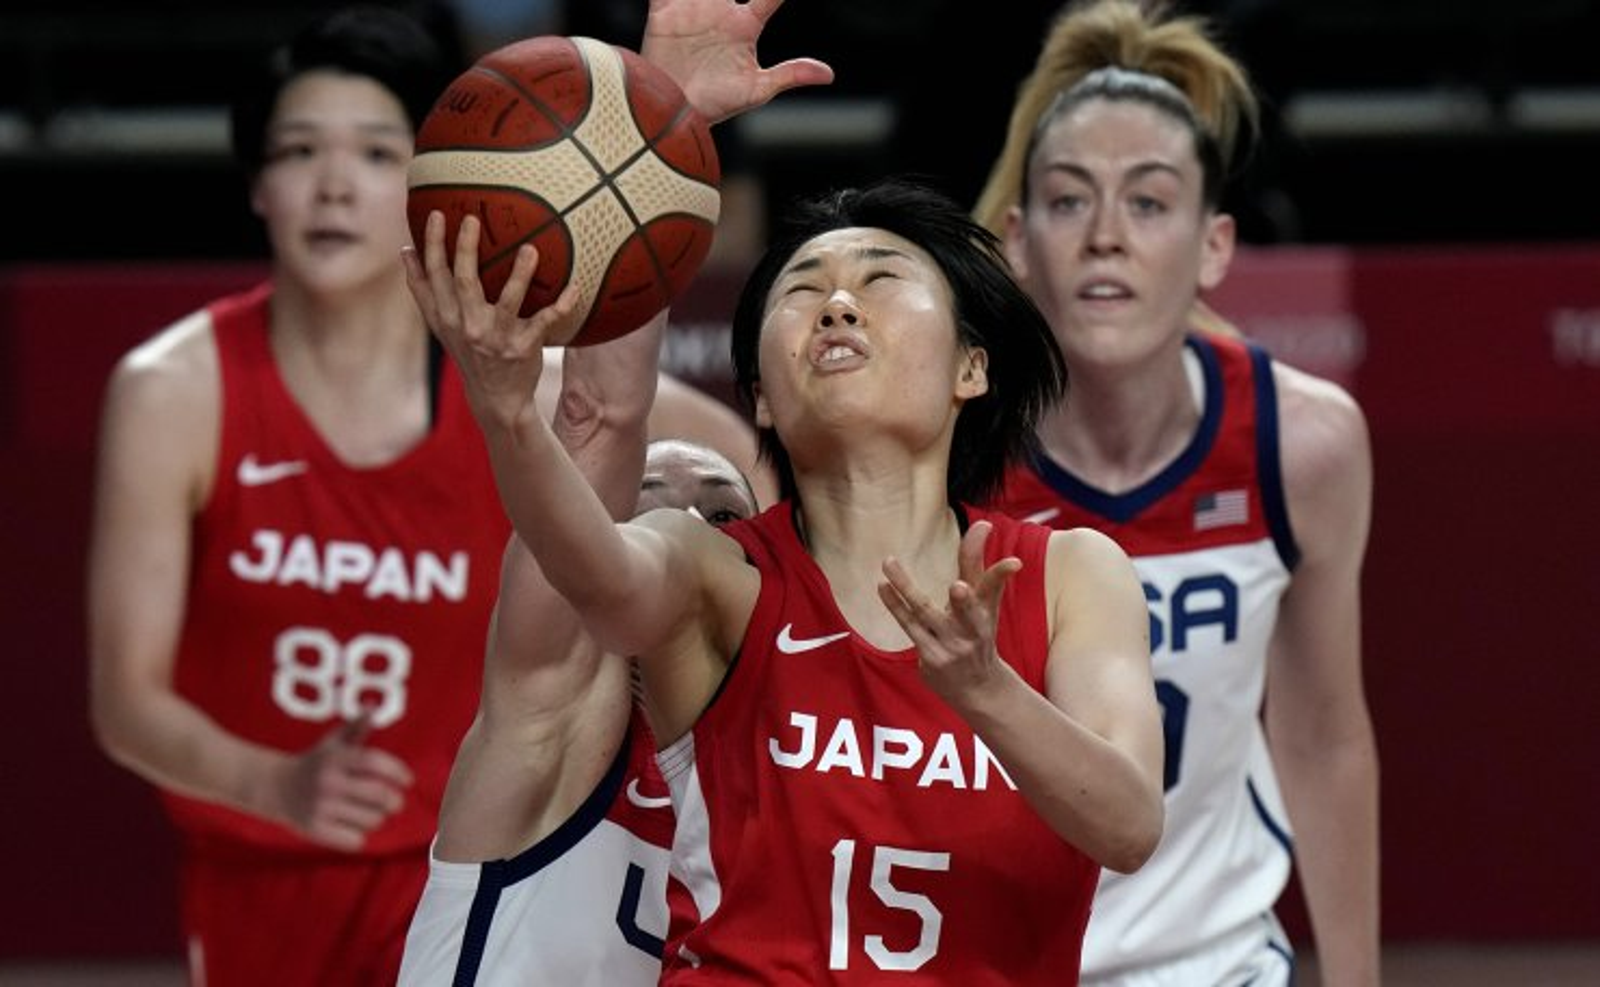 Japan's Nako Motohashi (15) drives ahead of United States' Breanna Stewart (10), right, during women's basketball gold medal game at the 2020 Summer Olympics, Sunday, Aug. 8, 2021, in Saitama, Japan. AP